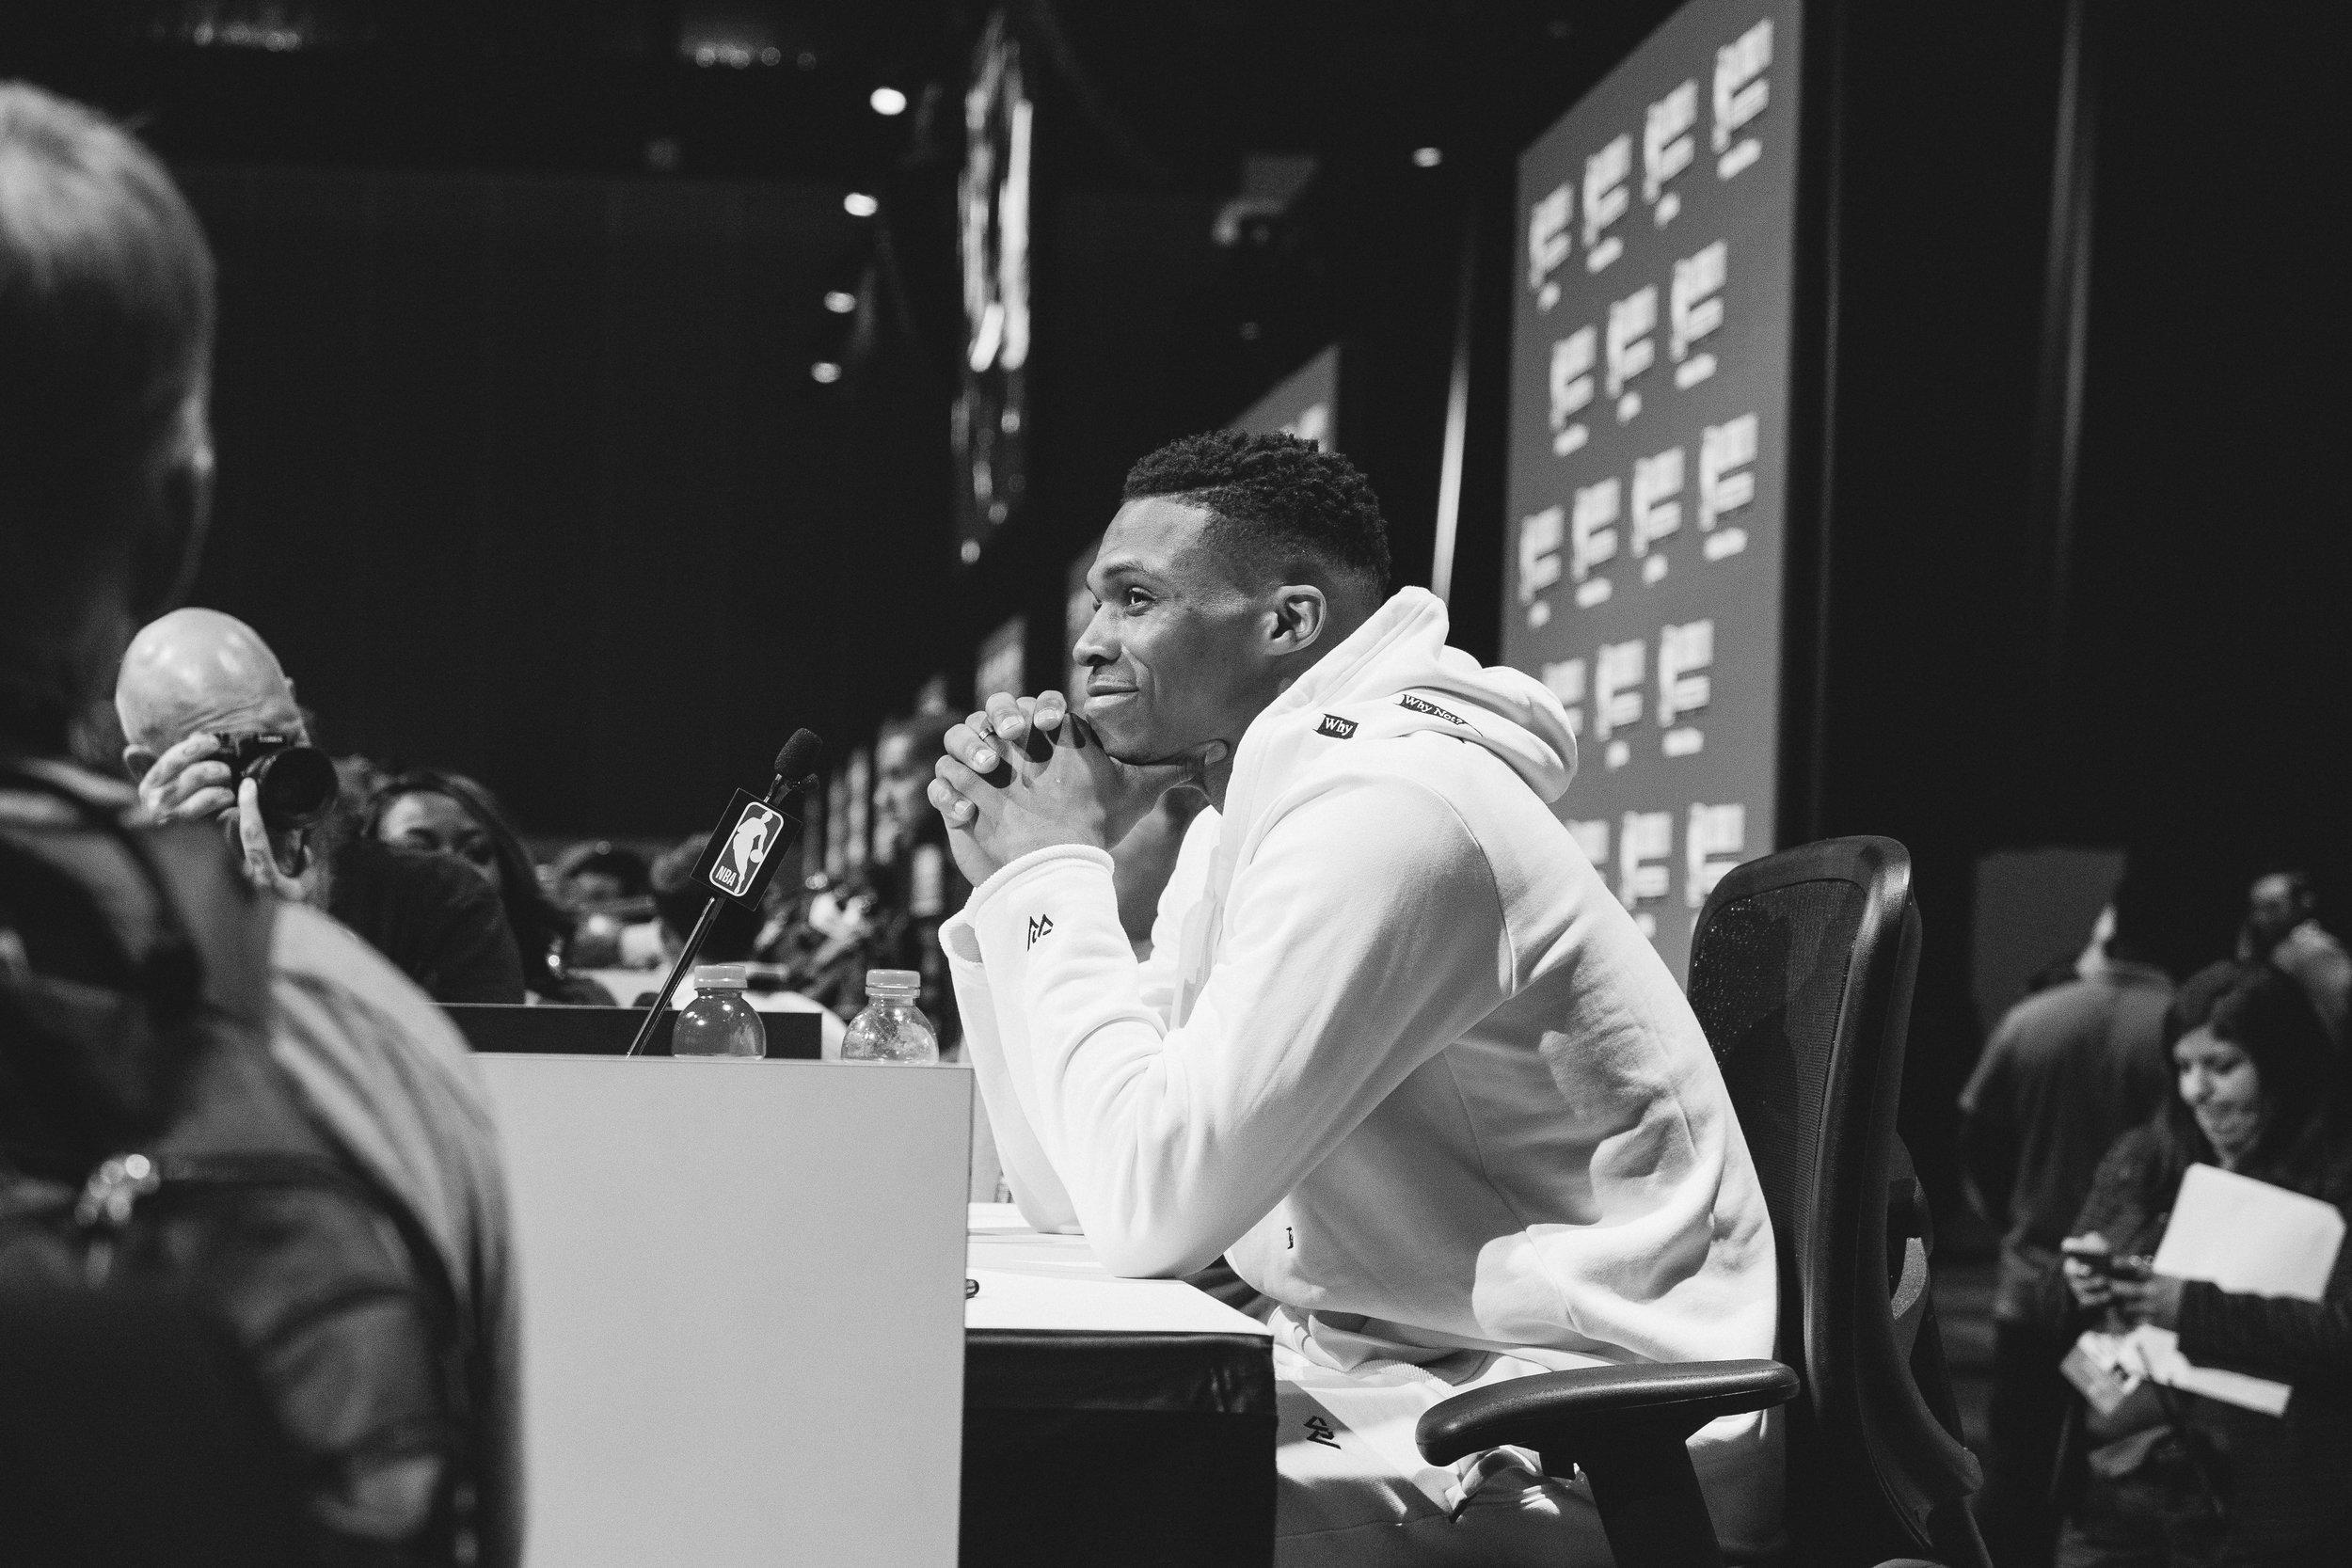 NBA_ALL_STAR_MEDIA_DAYKENNETH_STGEORGE_PHOTOGRAPHY_2018-31.jpg